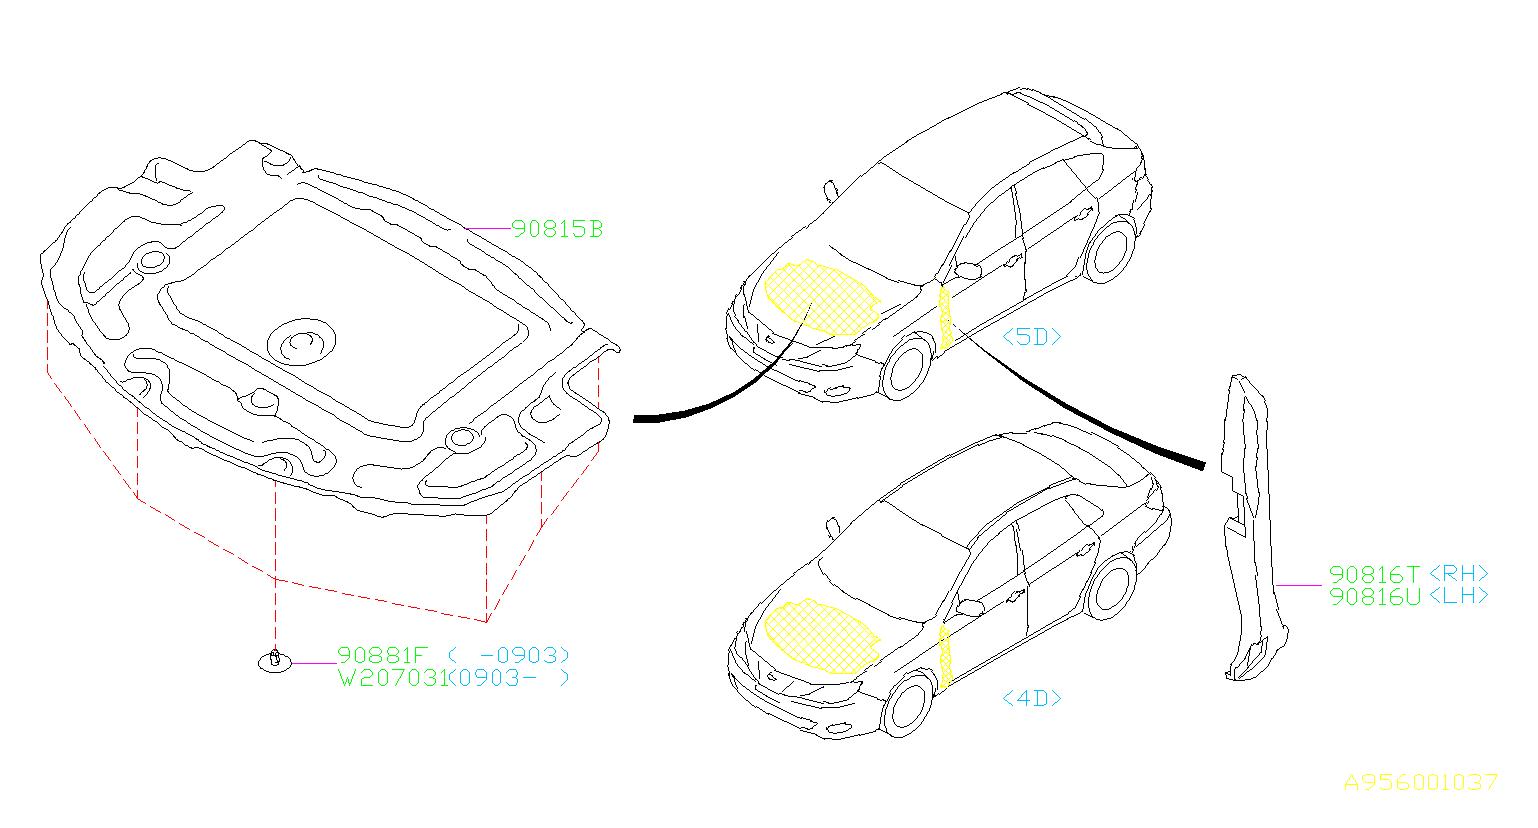 tags: #1999 subaru forester radio wiring diagram#1999 subaru forester  filters#1999 subaru legacy wagon parts#1999 subaru forester pluse#1999  subaru legacy